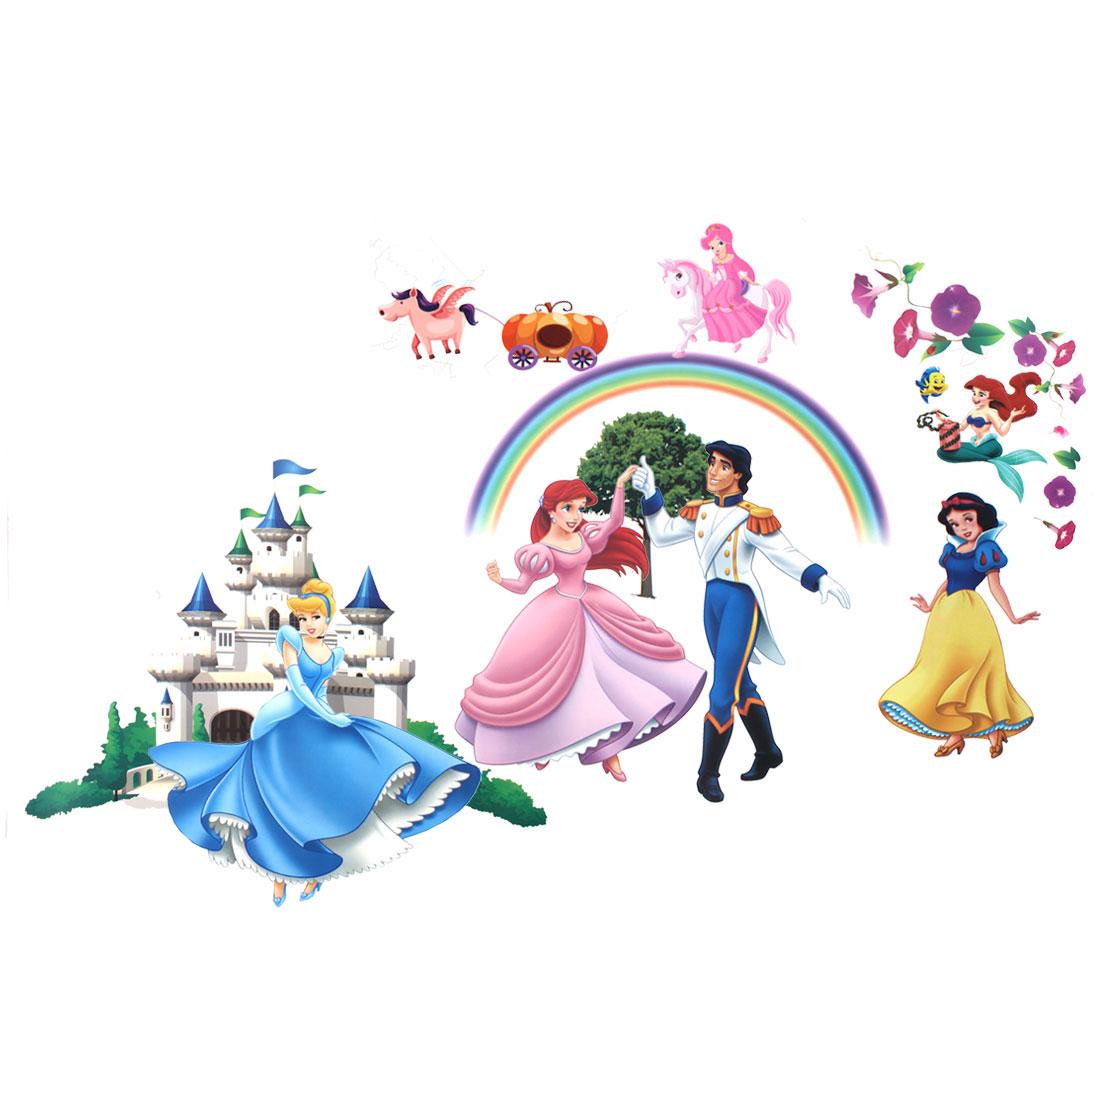 Cartoon Princess Prince Castle Design Wall Sticker Wallpaper Decor DIY